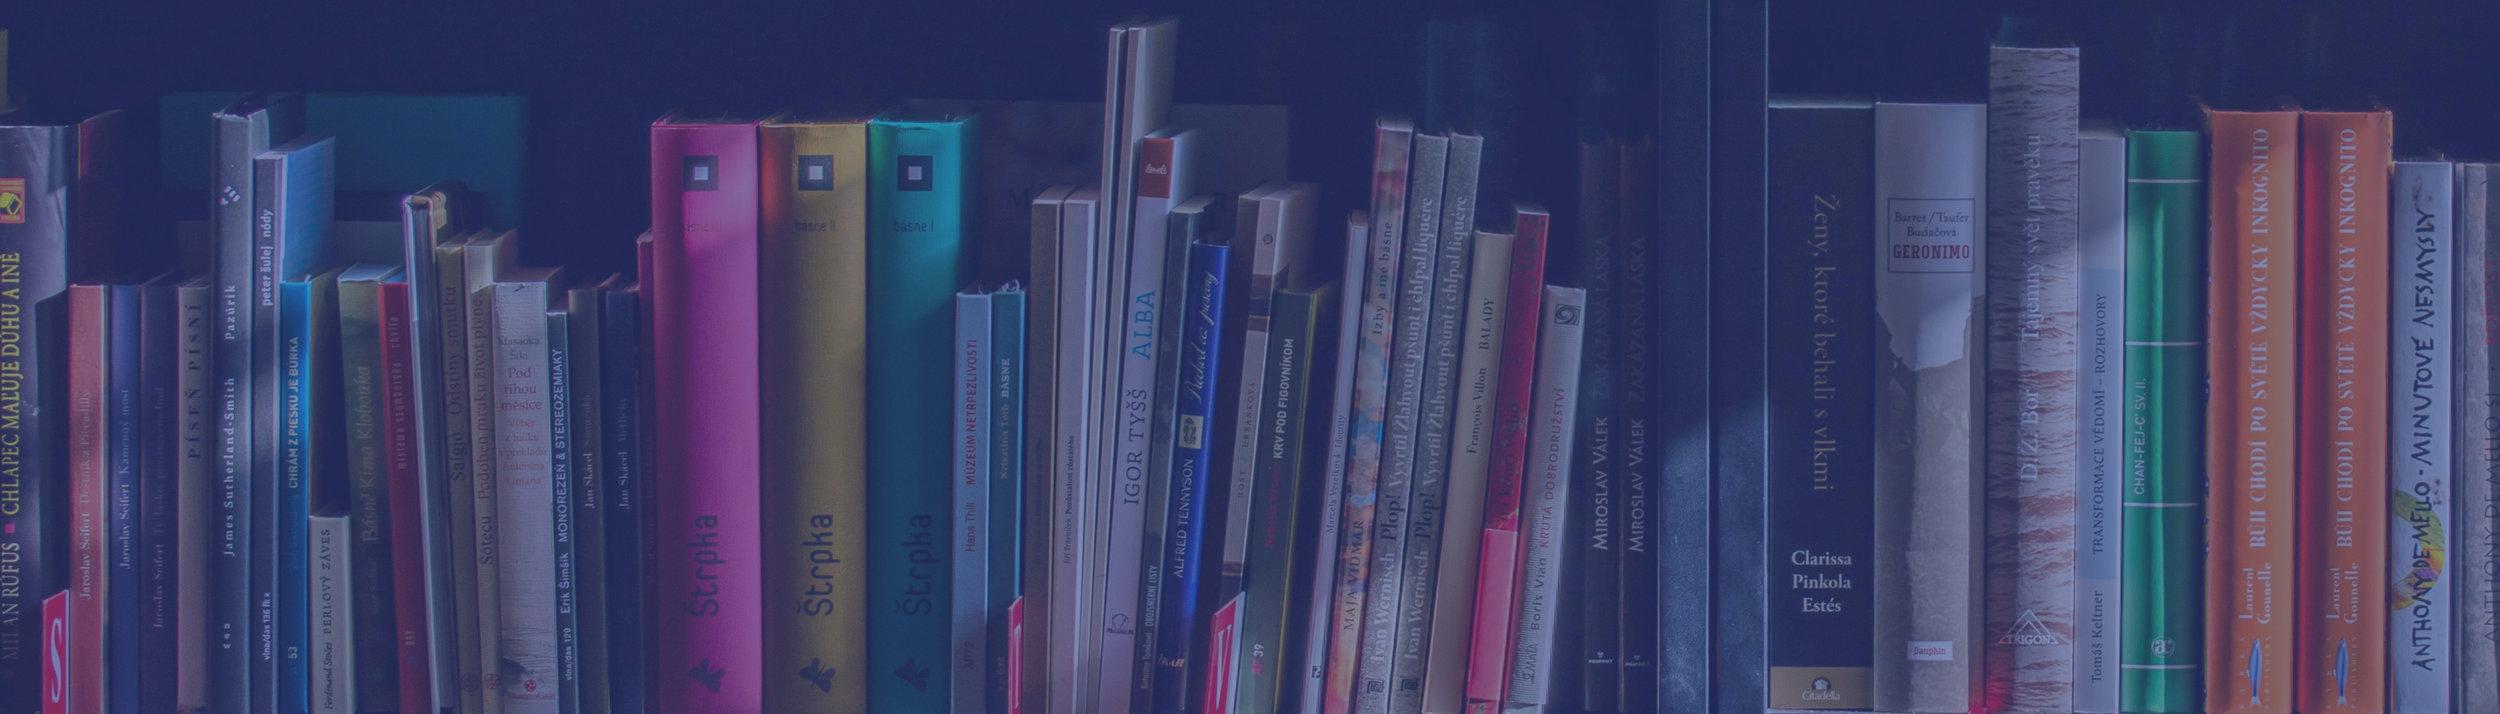 blue-book-stack.jpg